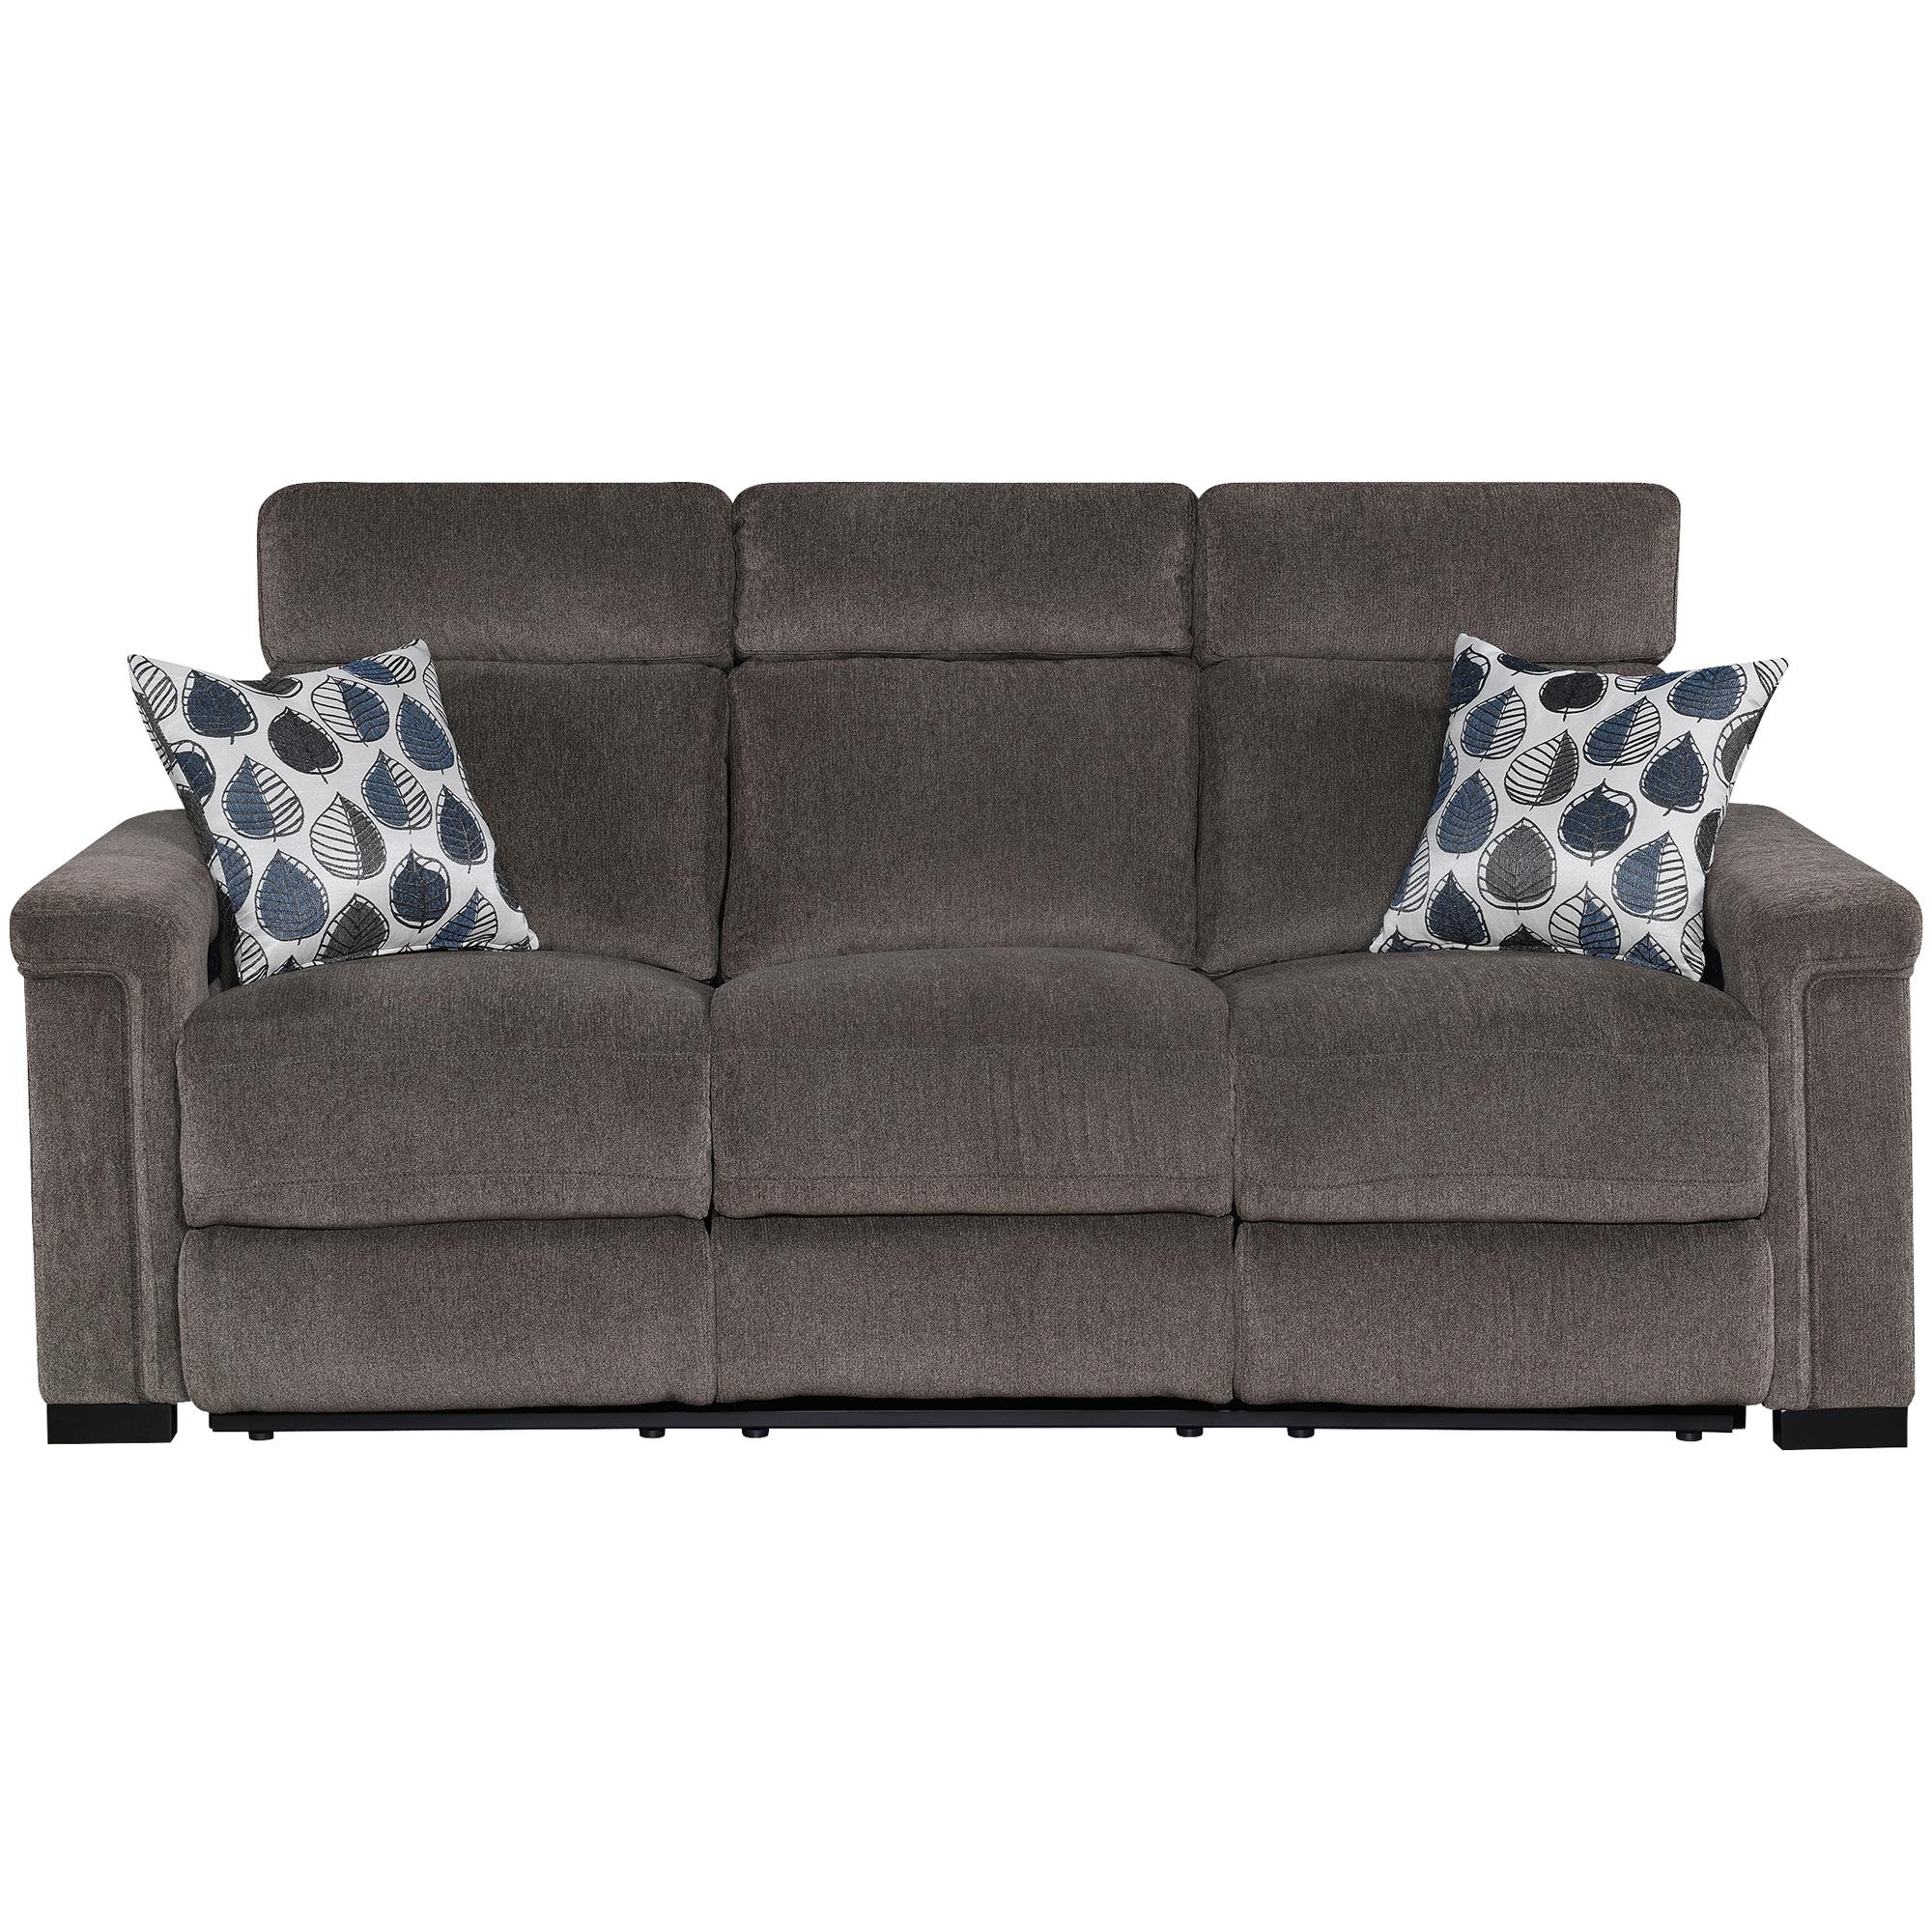 Motion 1Nnovations   Lavenue Brown Power Plus Reclining Sofa